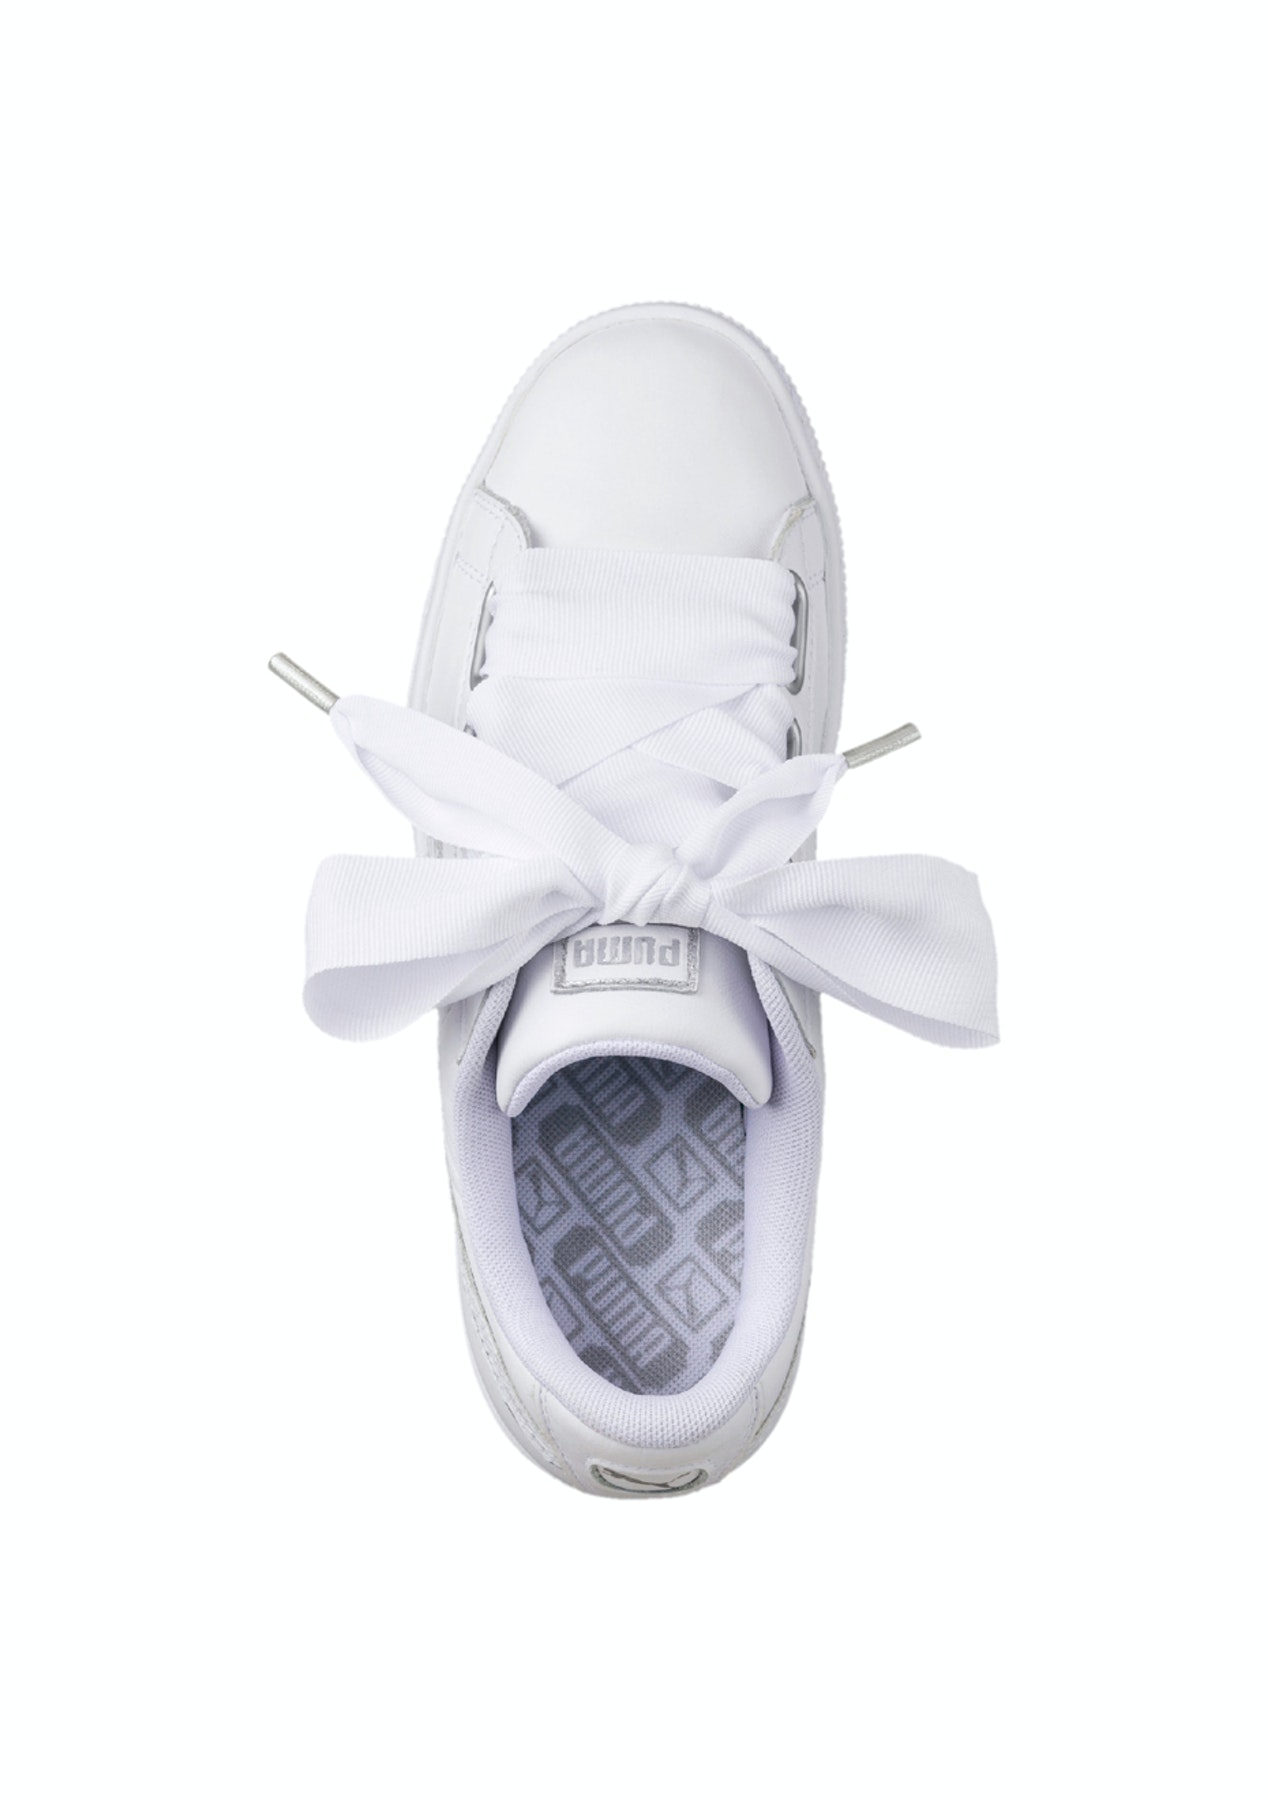 newest collection d8fb8 1d5a0 Puma Womens - Basket Heart Oceanaire - White